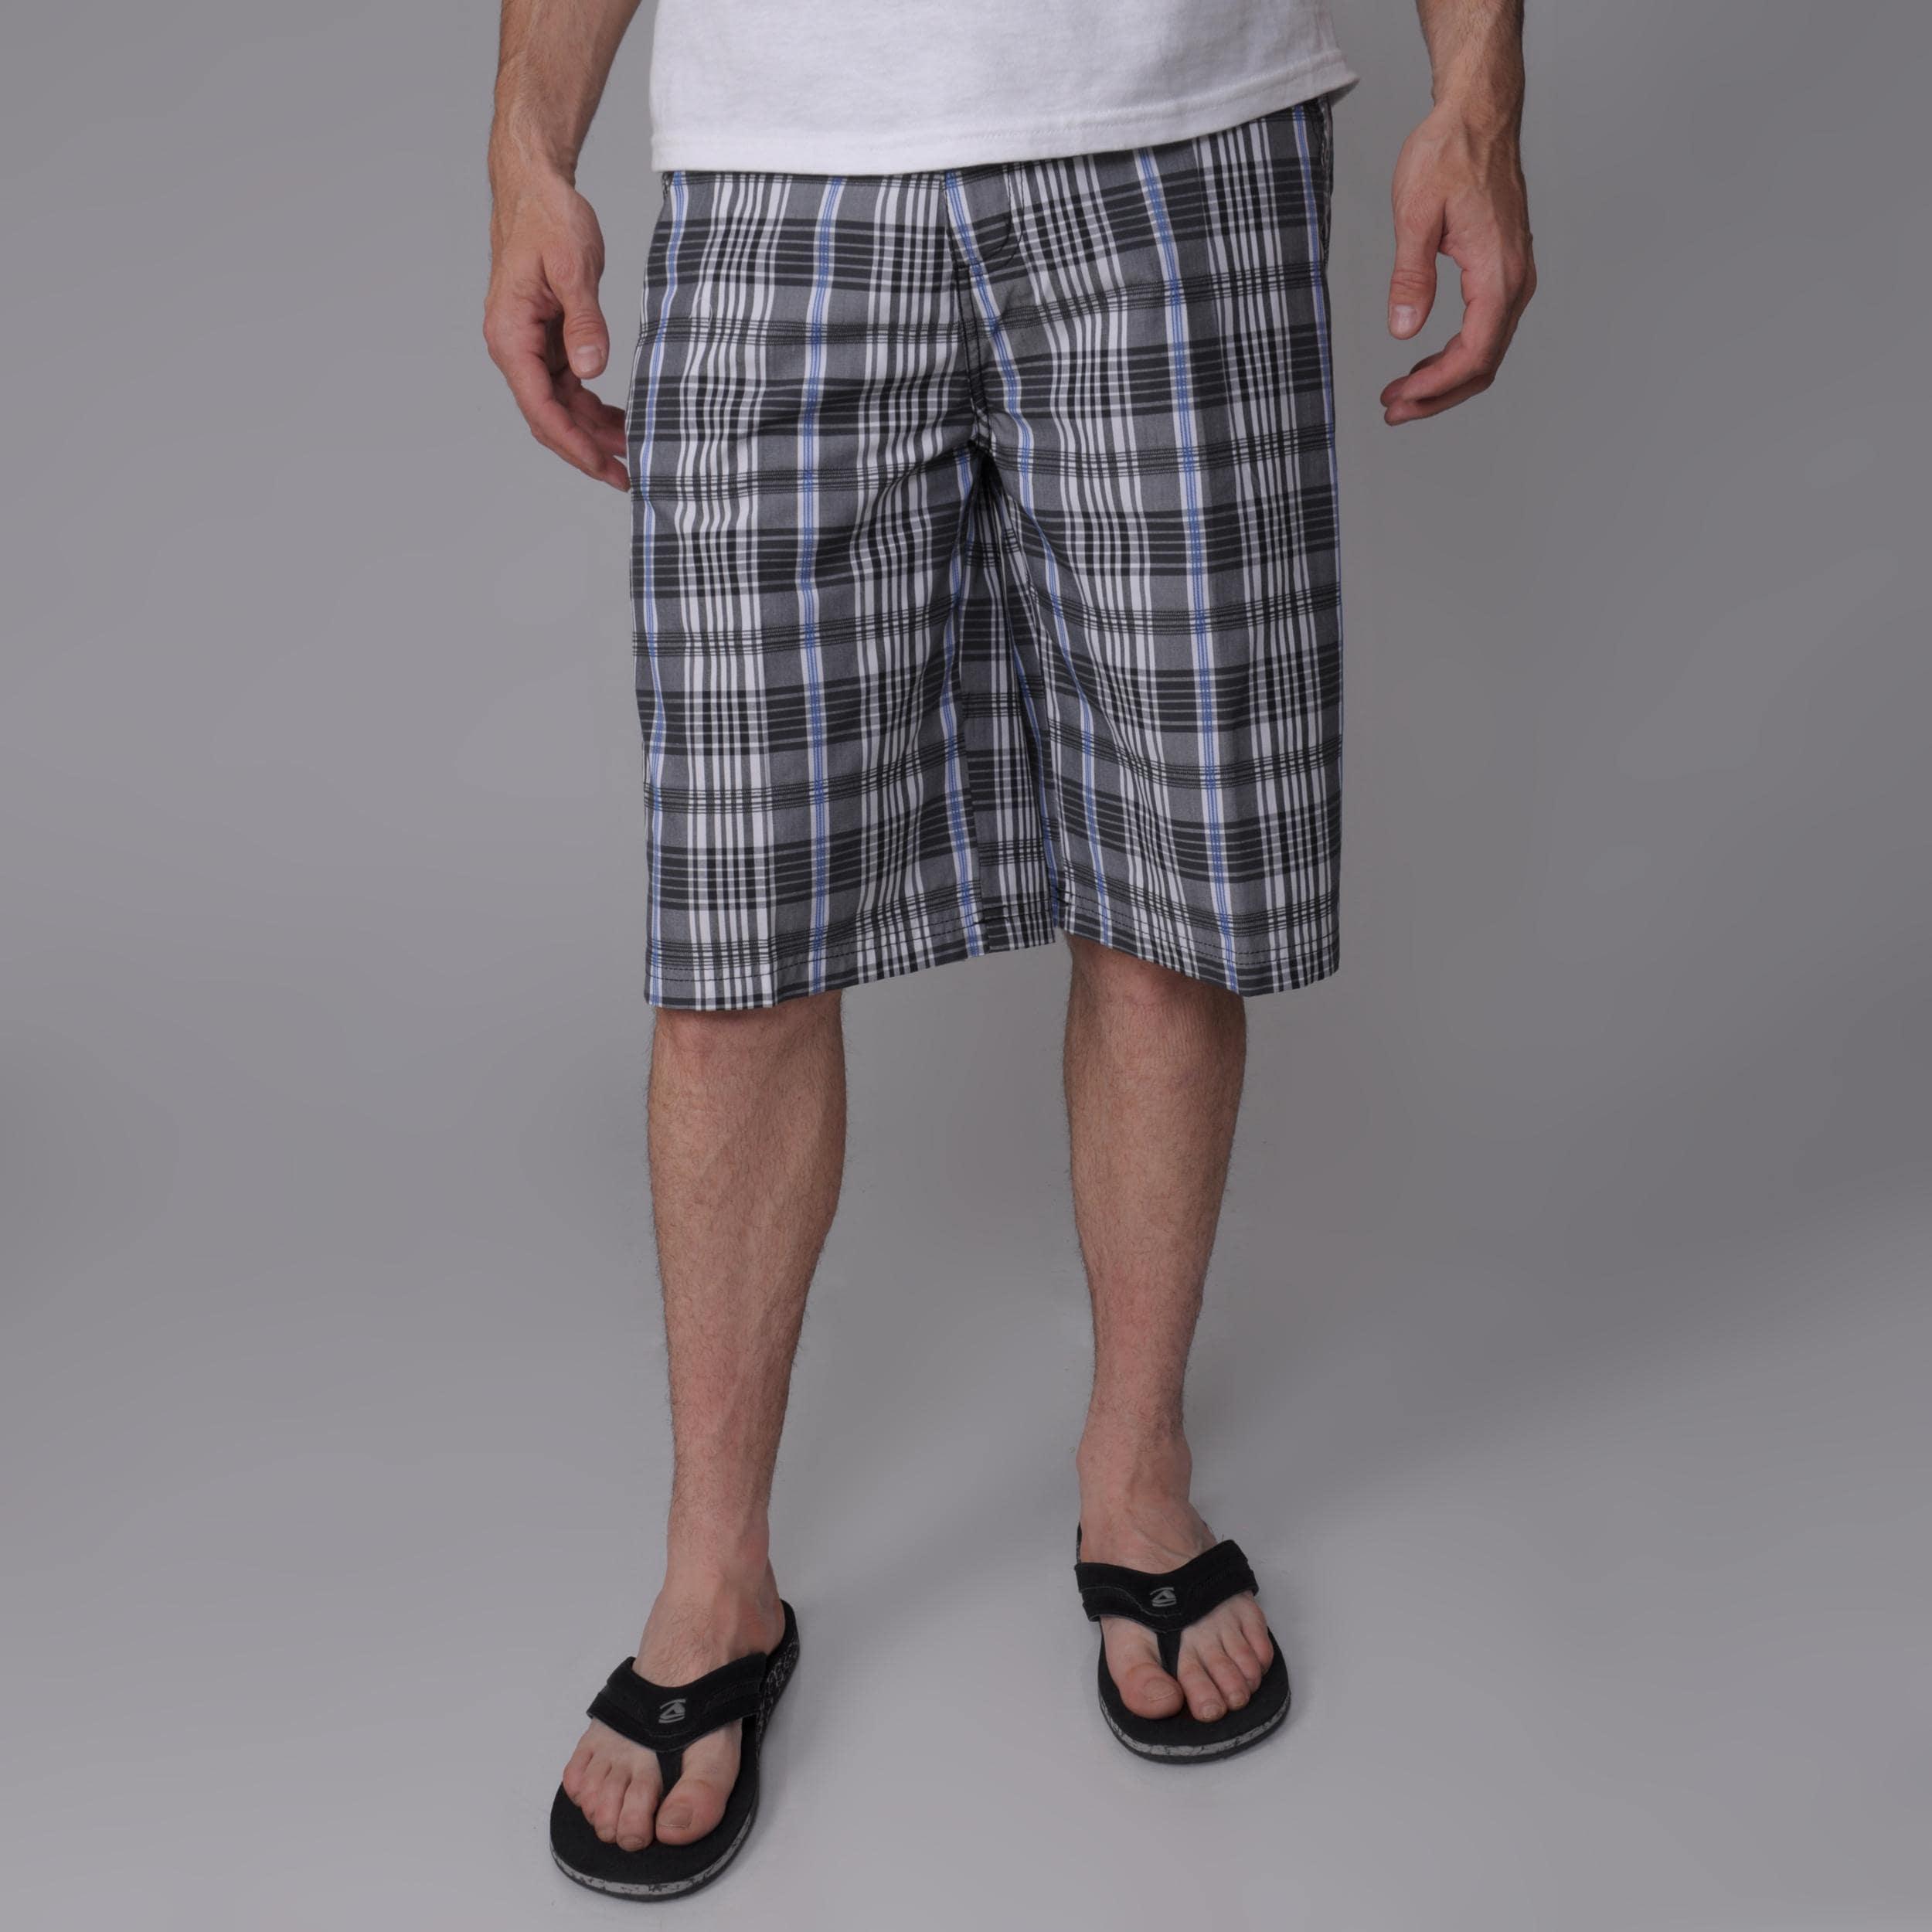 Charcoal Gioberti by Boston Traveler Men's Plaid Shorts